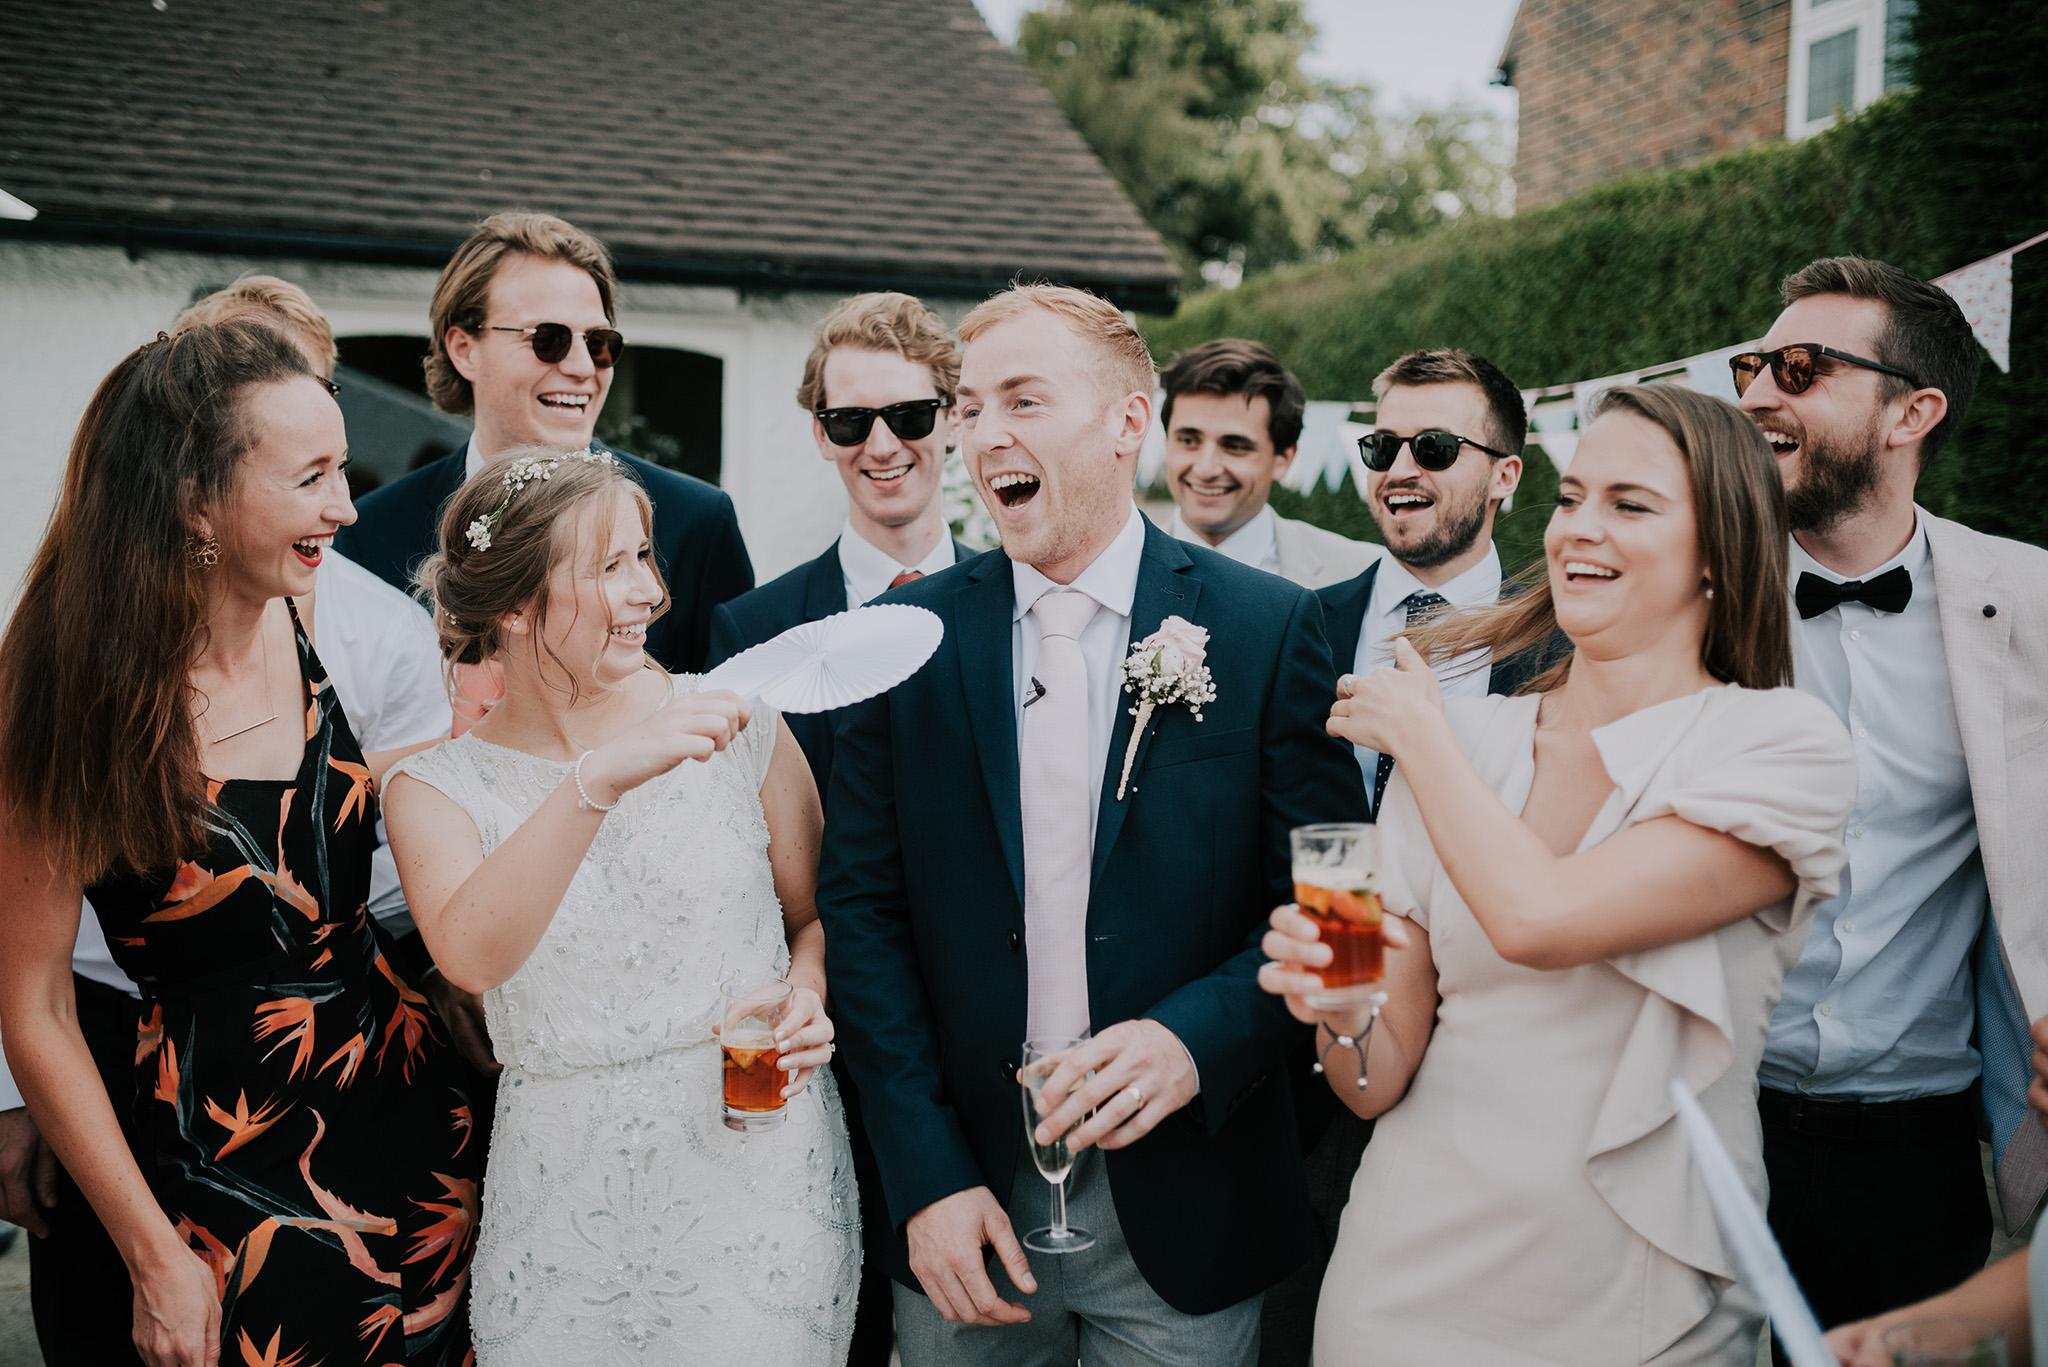 scott-stockwell-photography-wedding-37.jpg